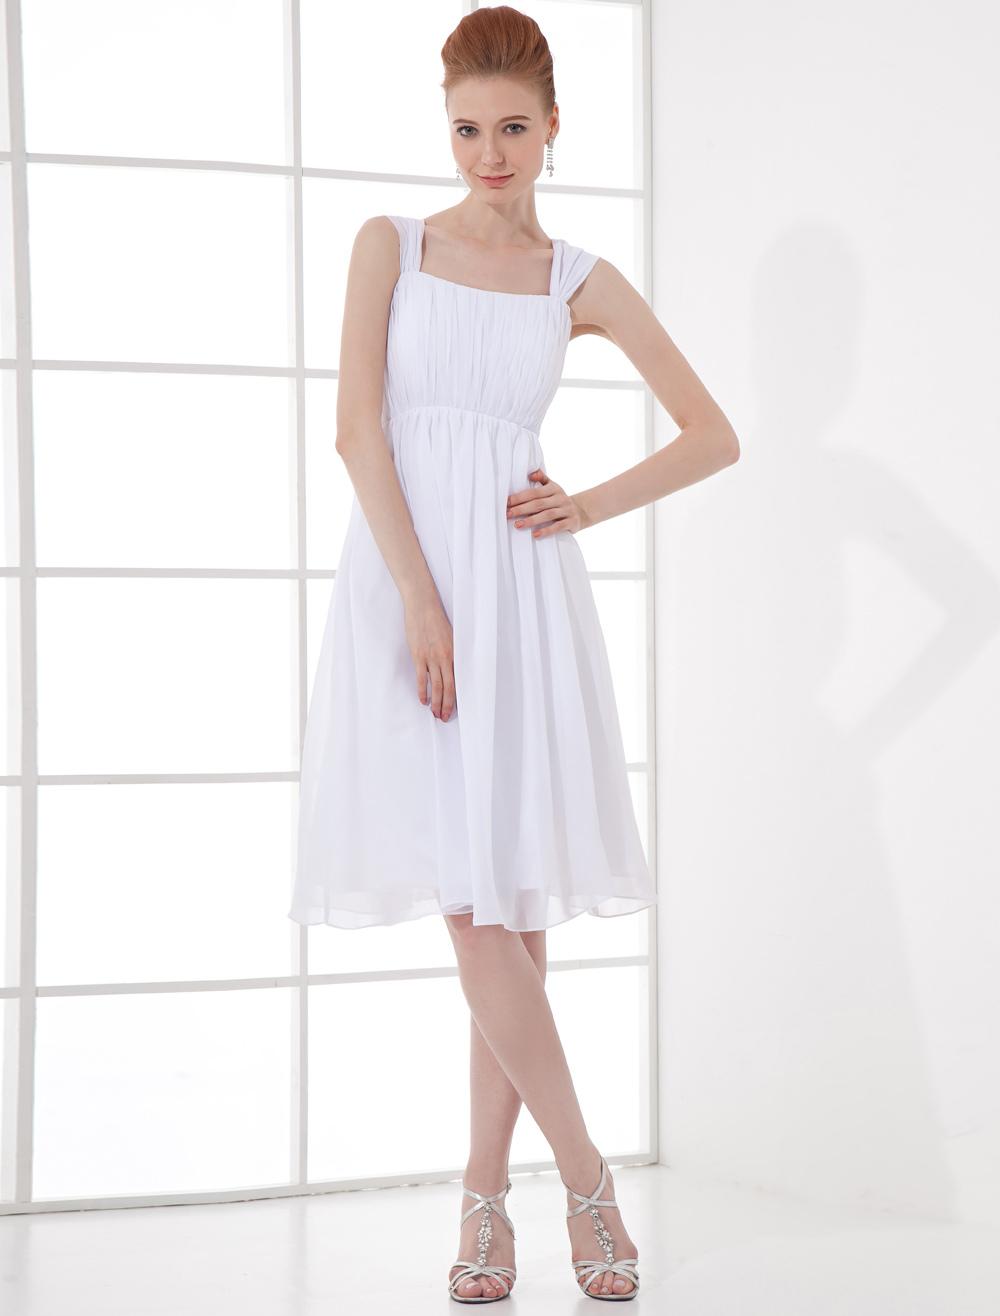 Chiffon Knee-Length Cocktail Dress